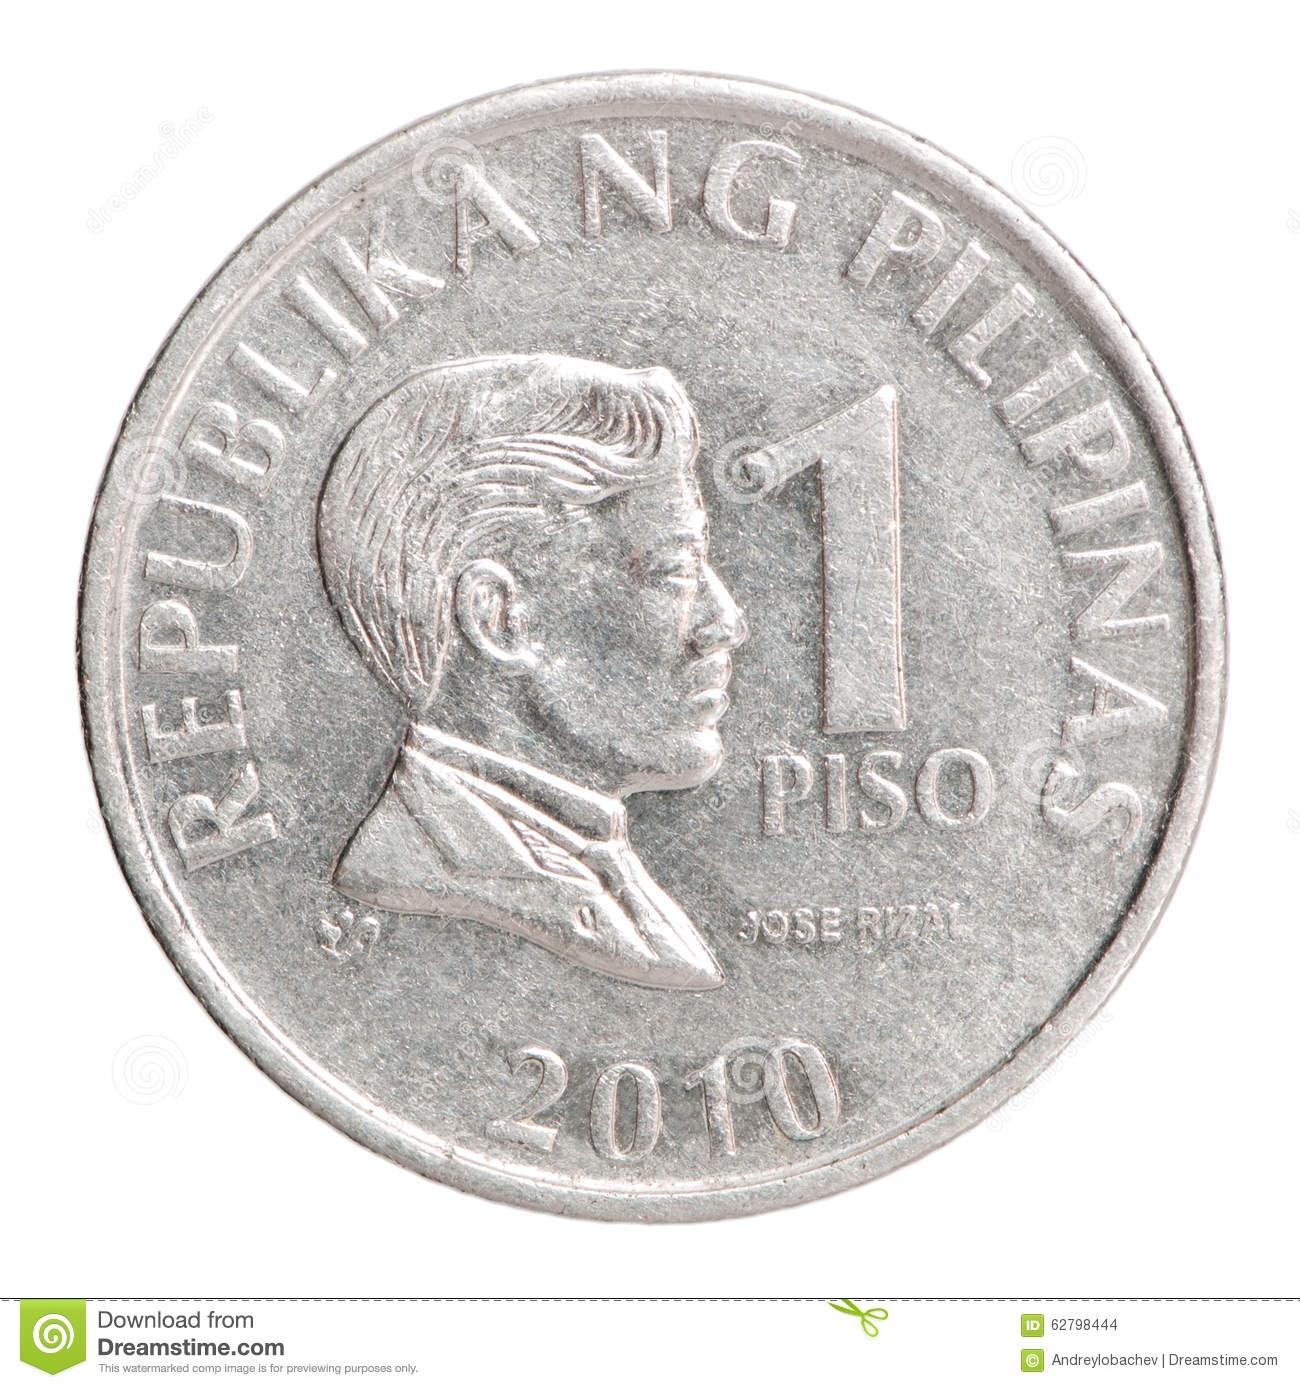 Coin clipart 5 peso Philippine coin Money White 5